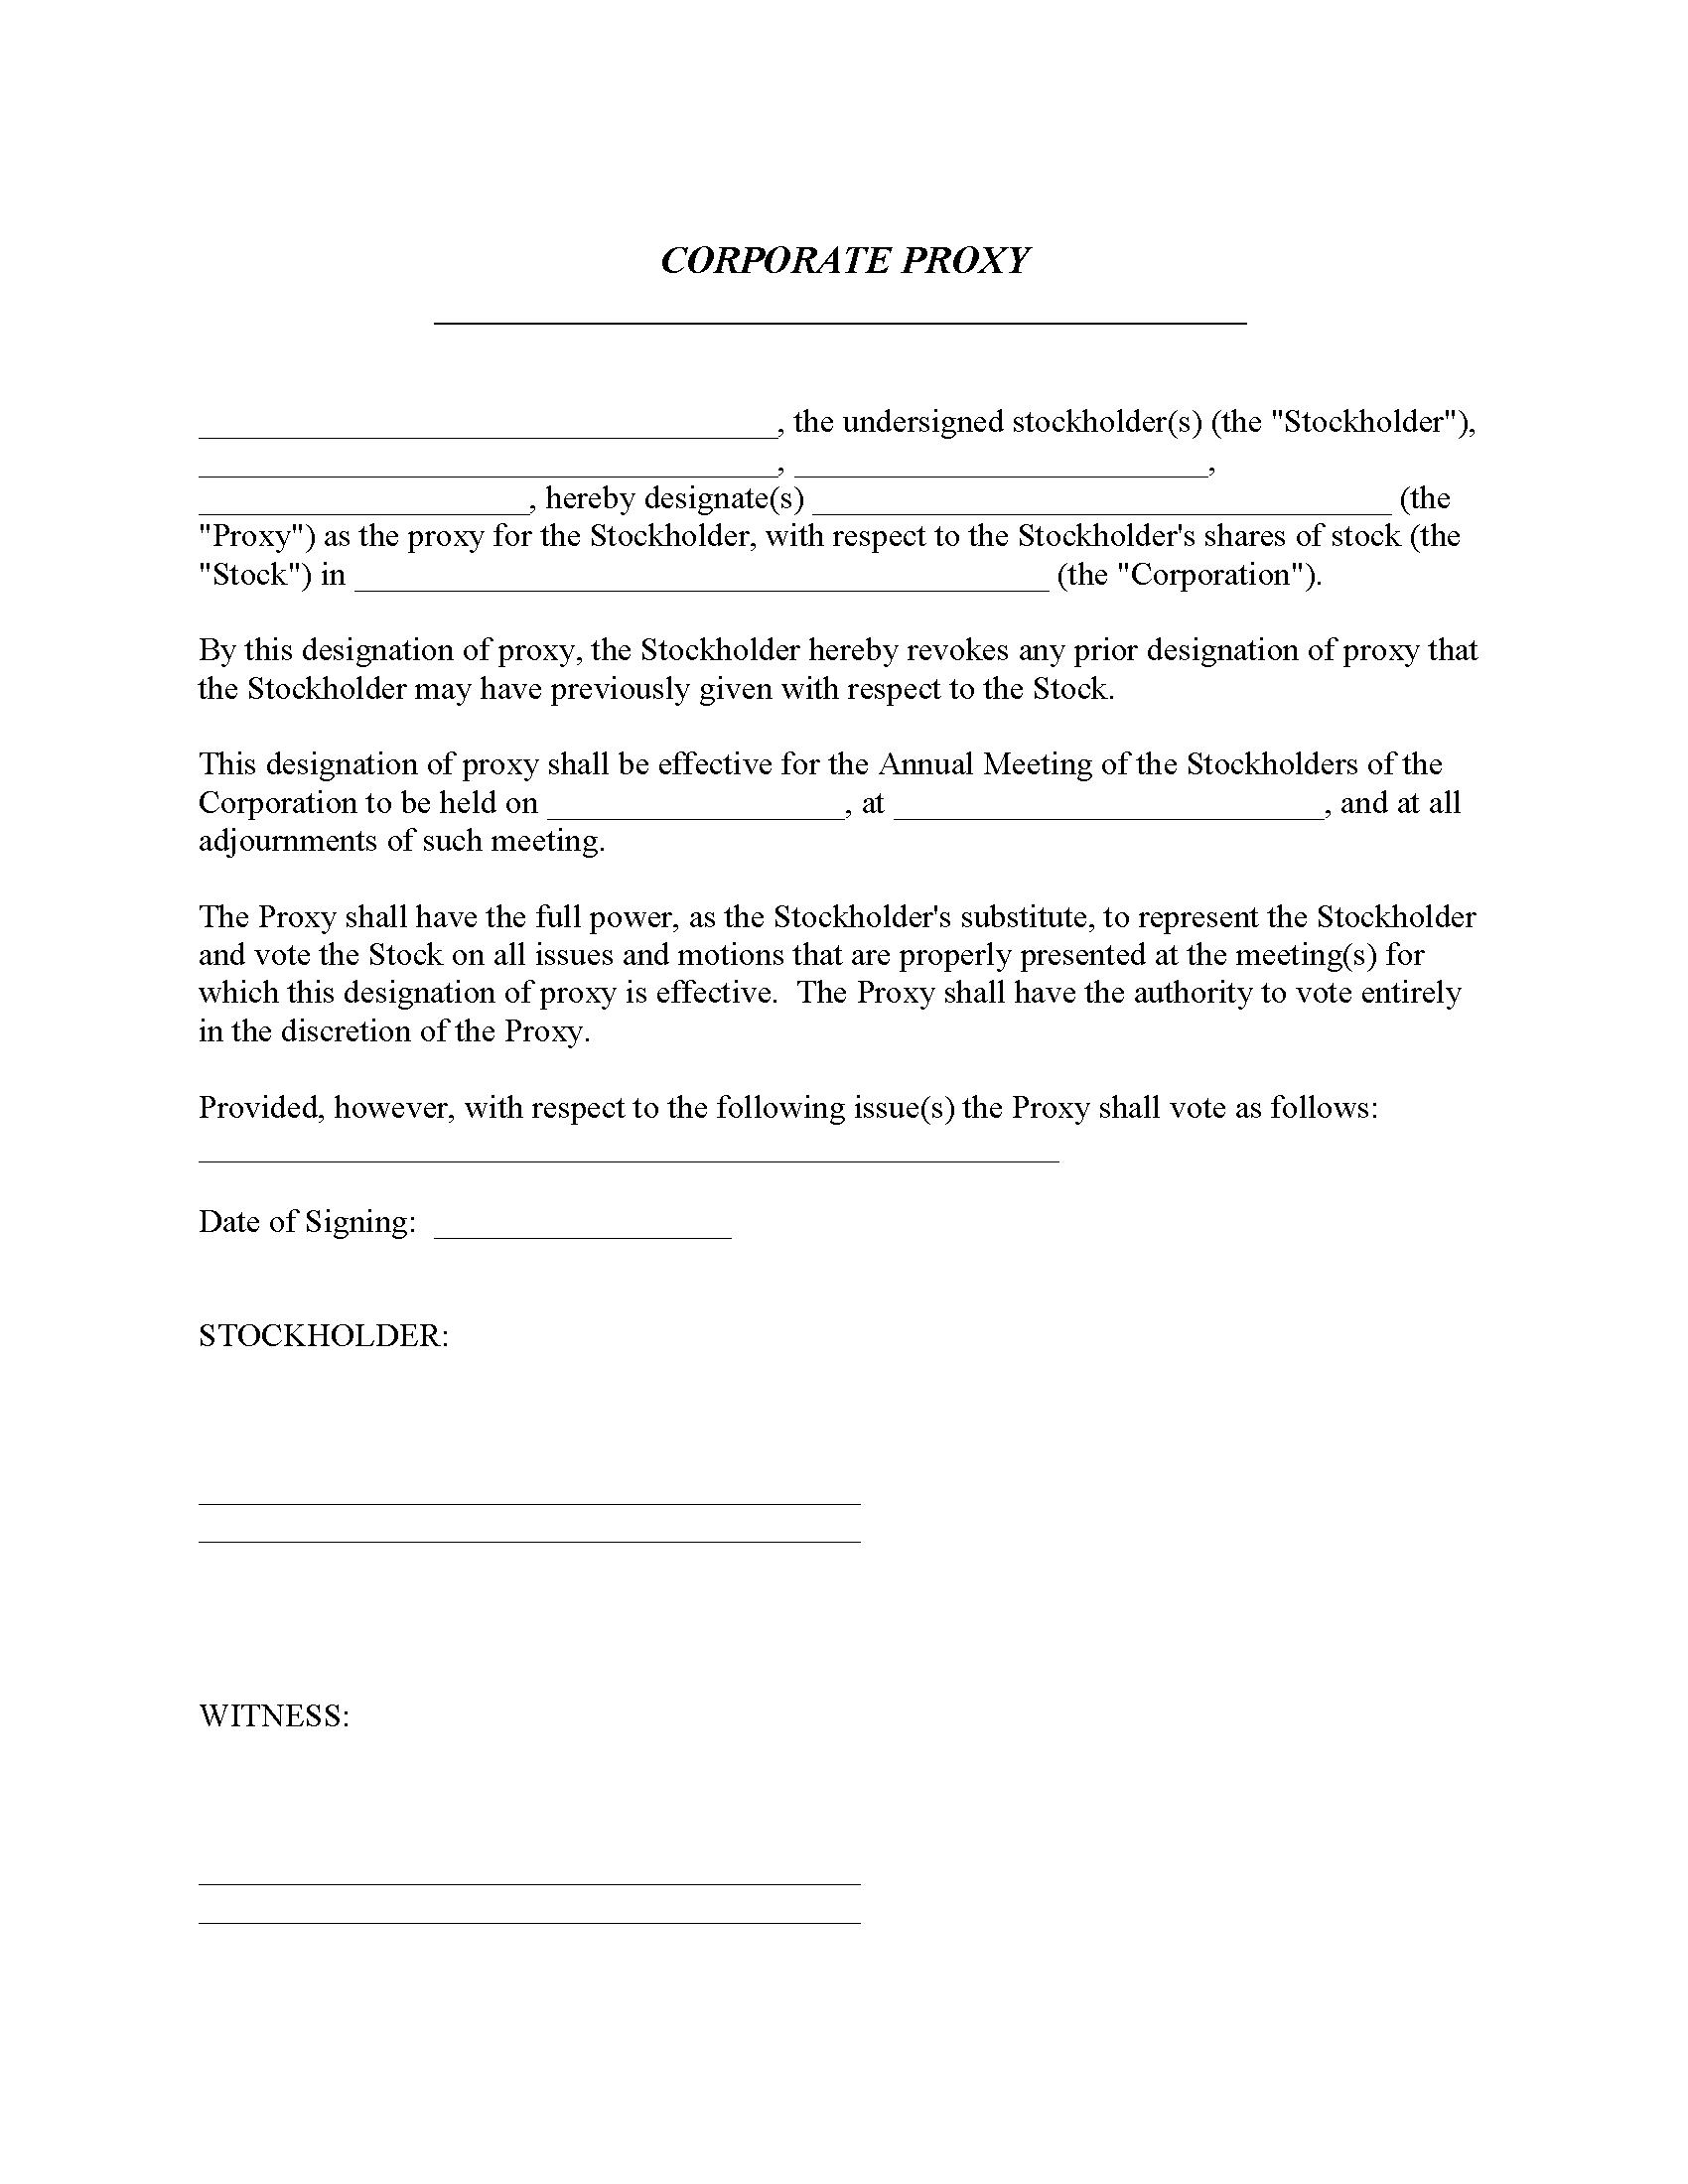 Corporate Proxy Form Fillable PDF Form